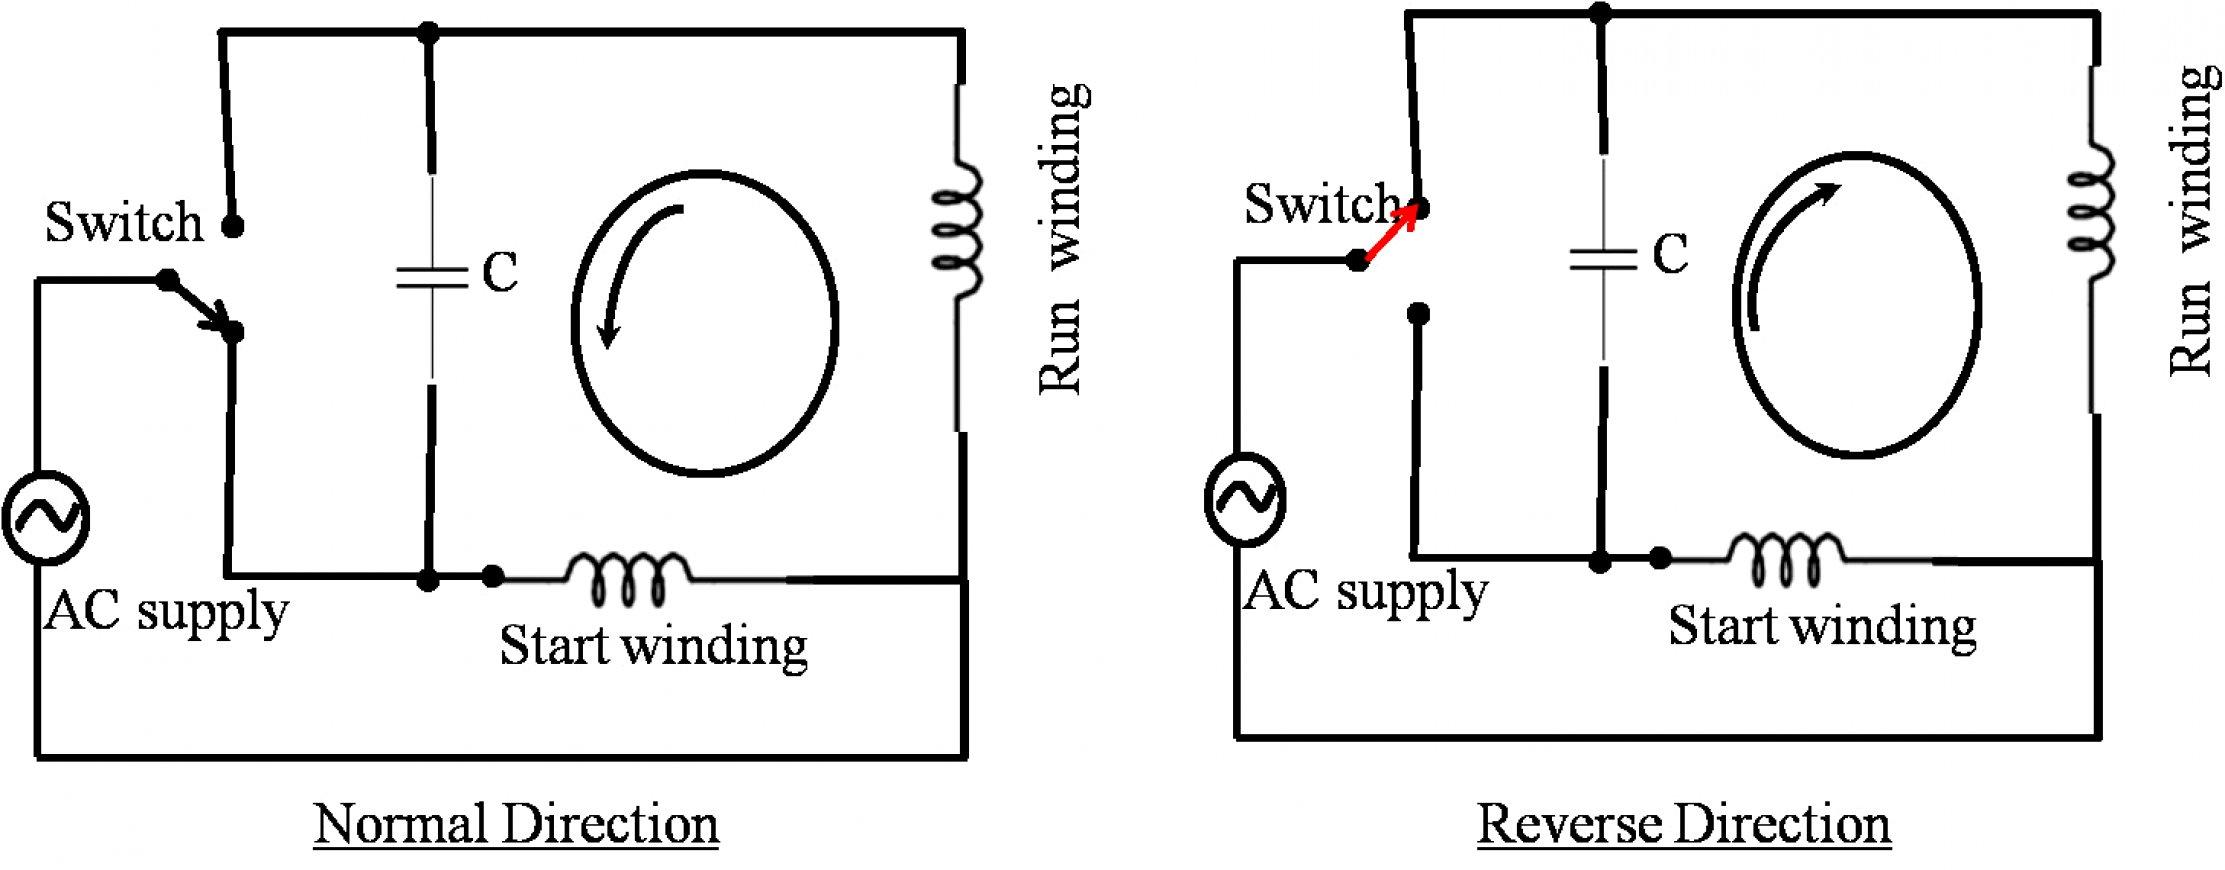 Great Of Wiring Diagram For Forward Reverse Single Phase Motor And - Reversing Single Phase Motor Wiring Diagram